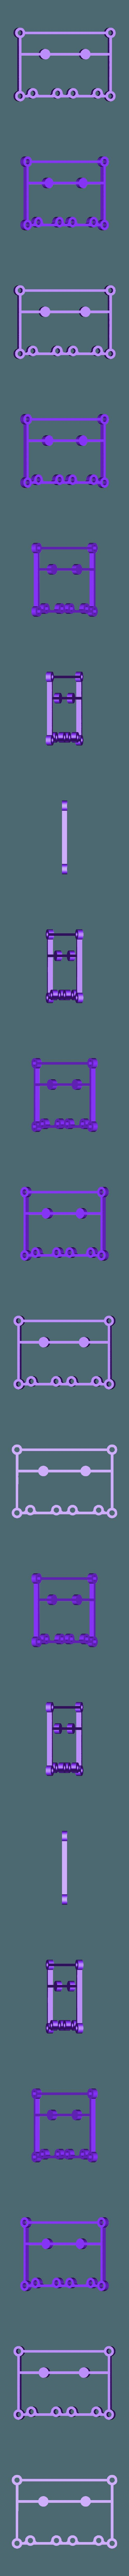 pytitano-ws-button-plate.stl Download free STL file ESP32 Retro Weather Station • 3D printer template, Adafruit